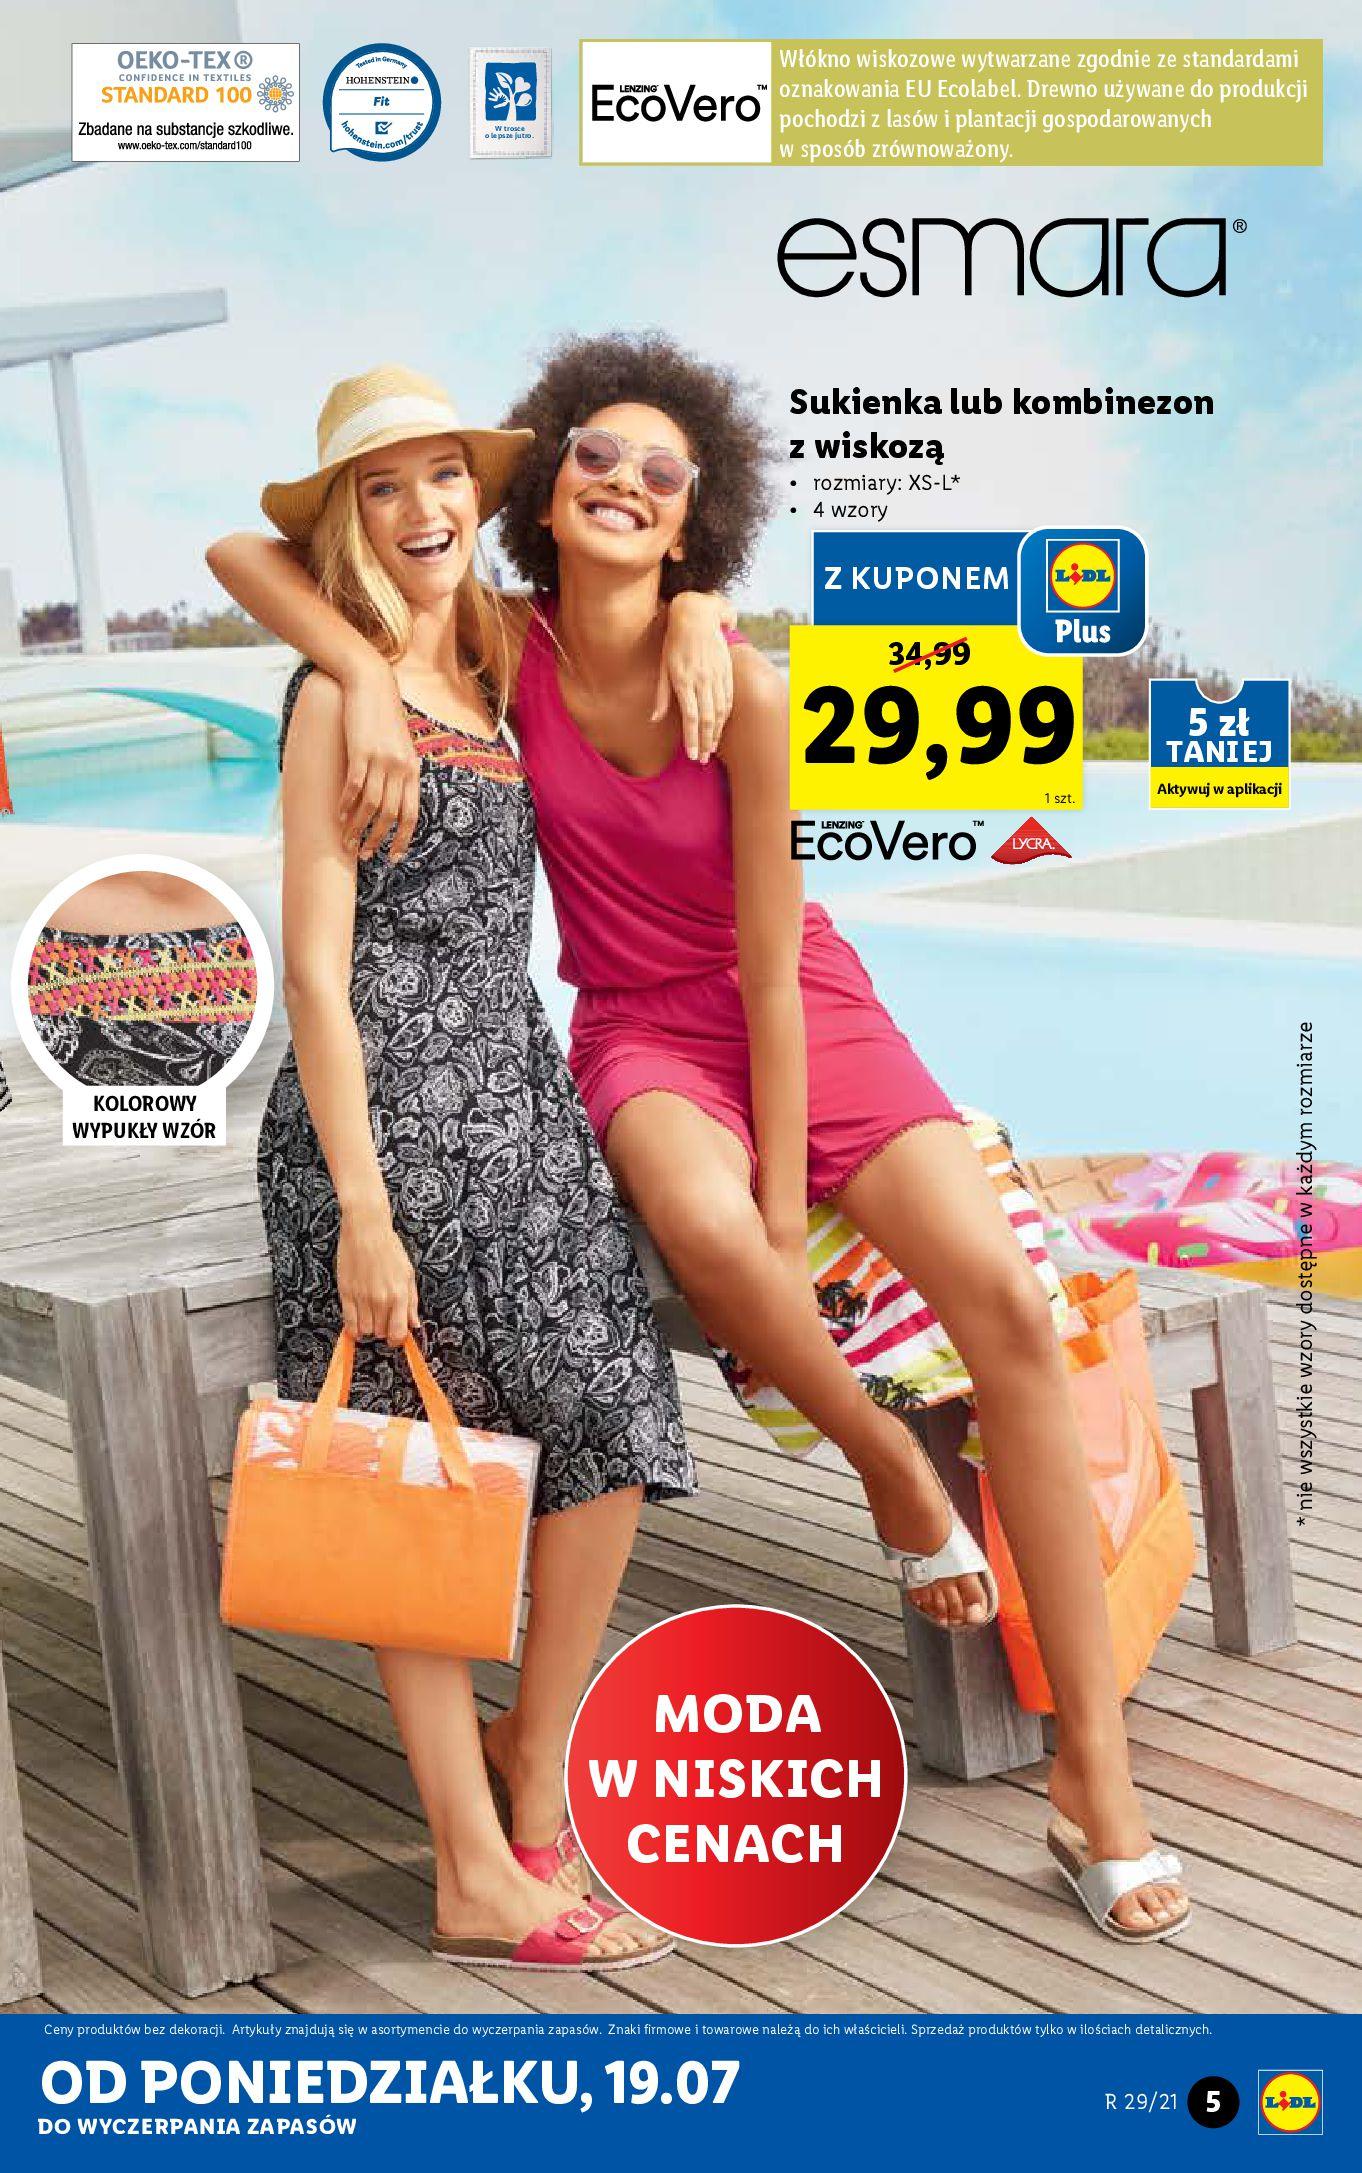 Gazetka Lidl: Gazetka Lidl - Katalog od 19.07 2021-07-19 page-5